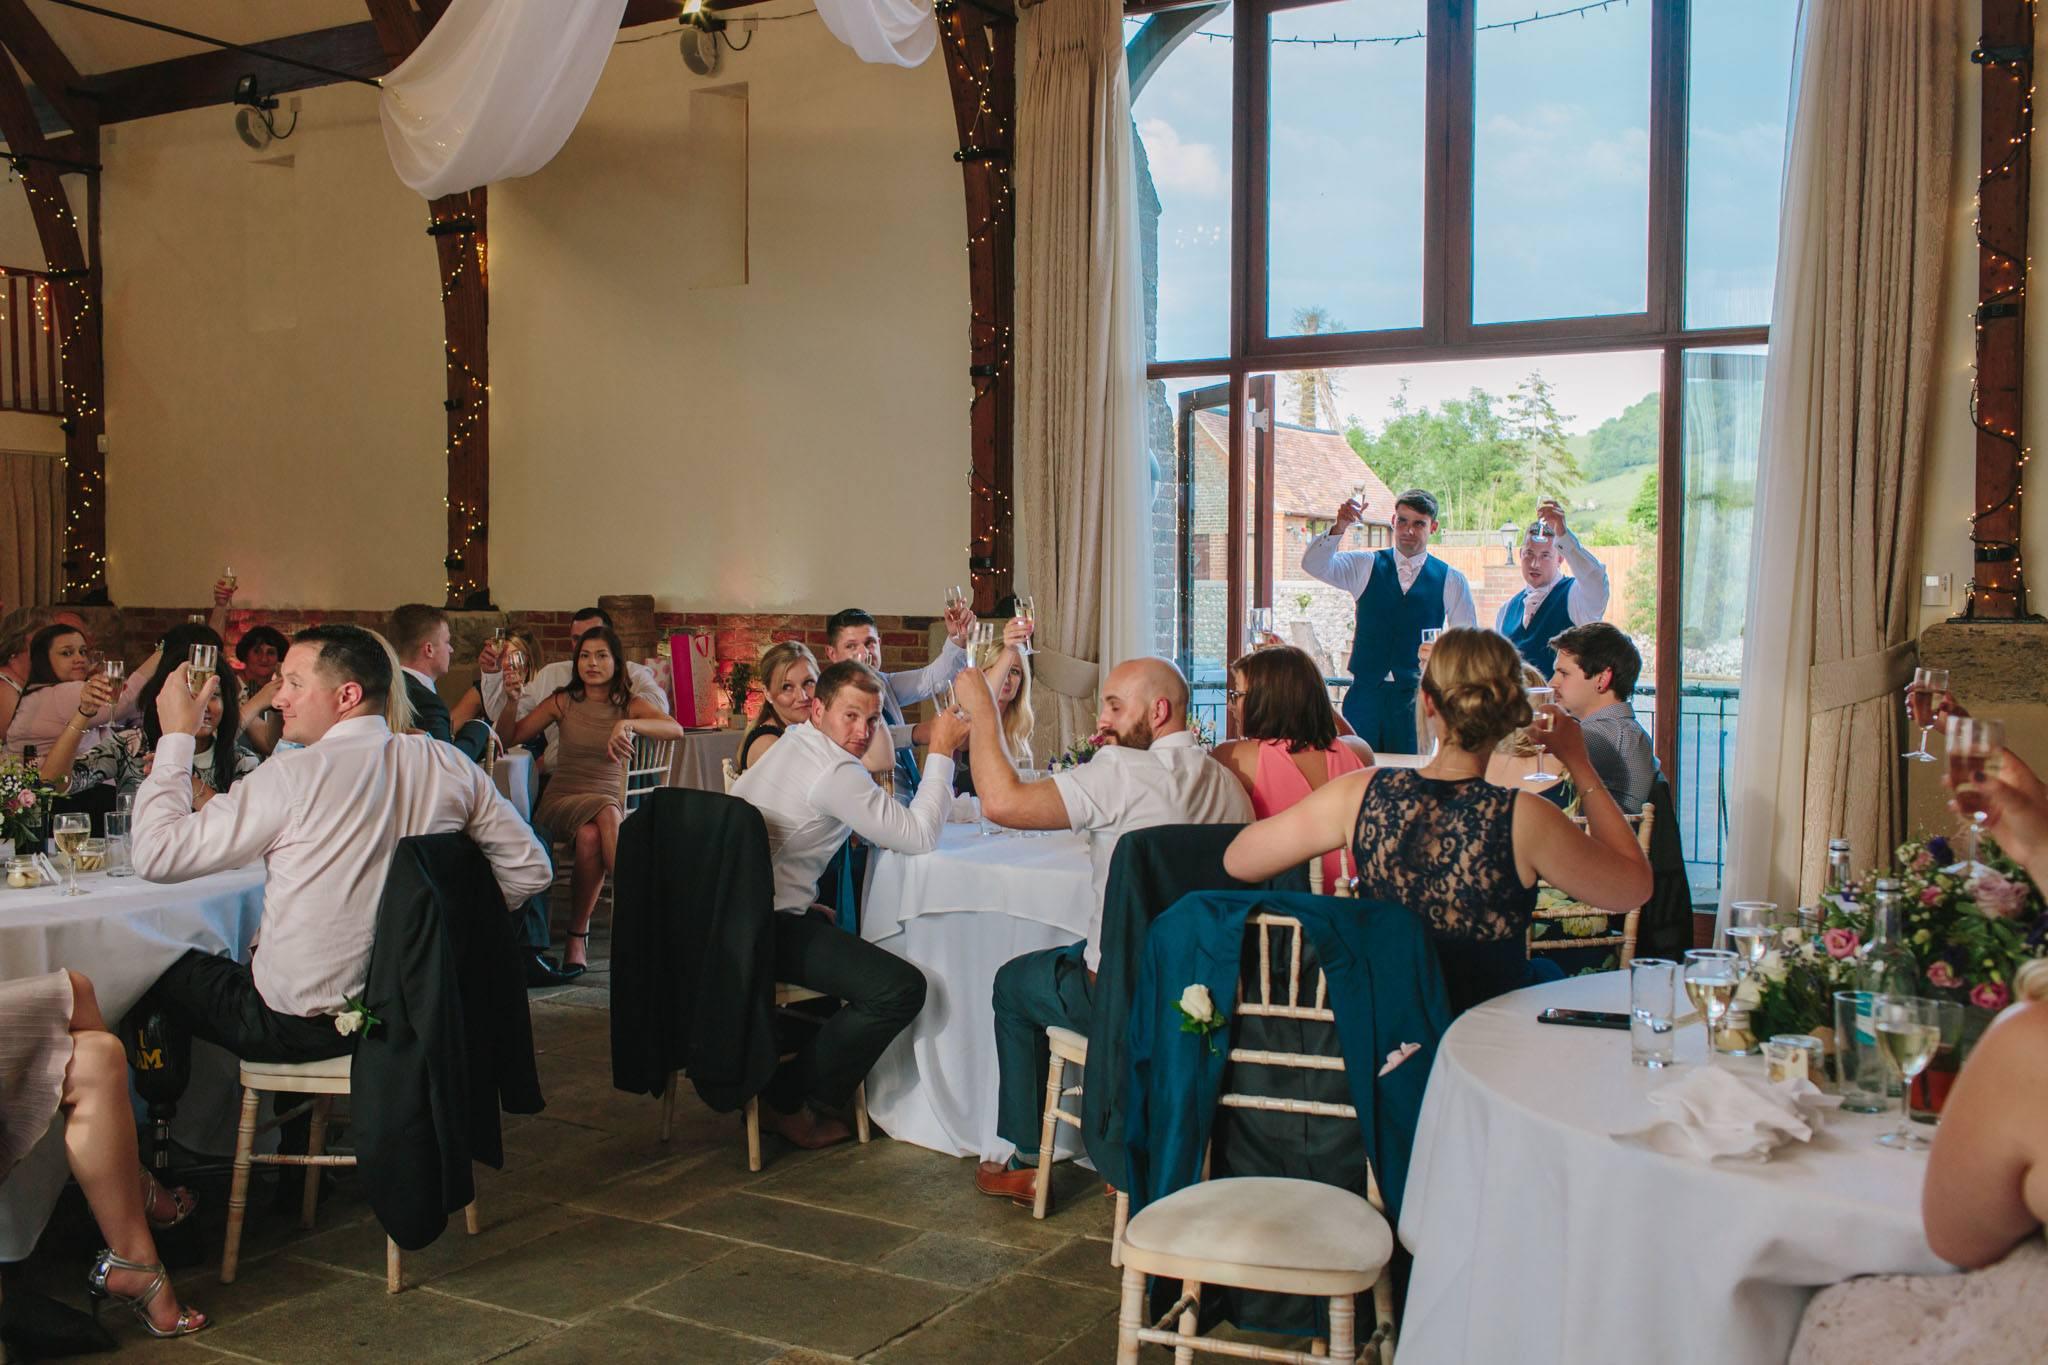 brighton wedding photographer, alternative wedding photography